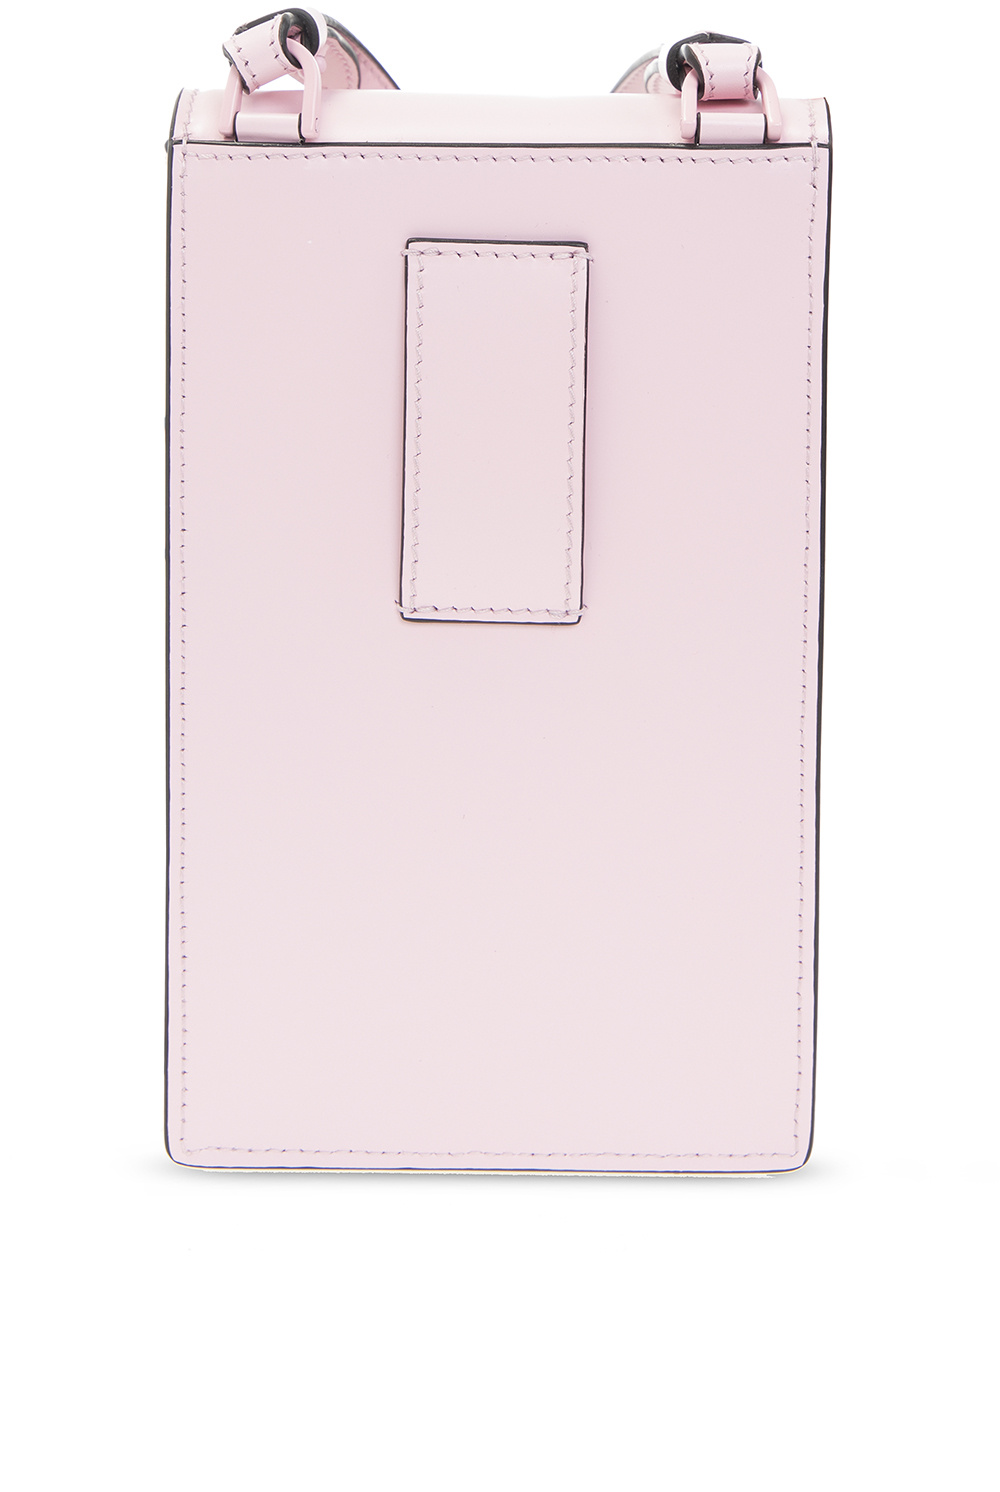 Salvatore Ferragamo Phone holder with logo